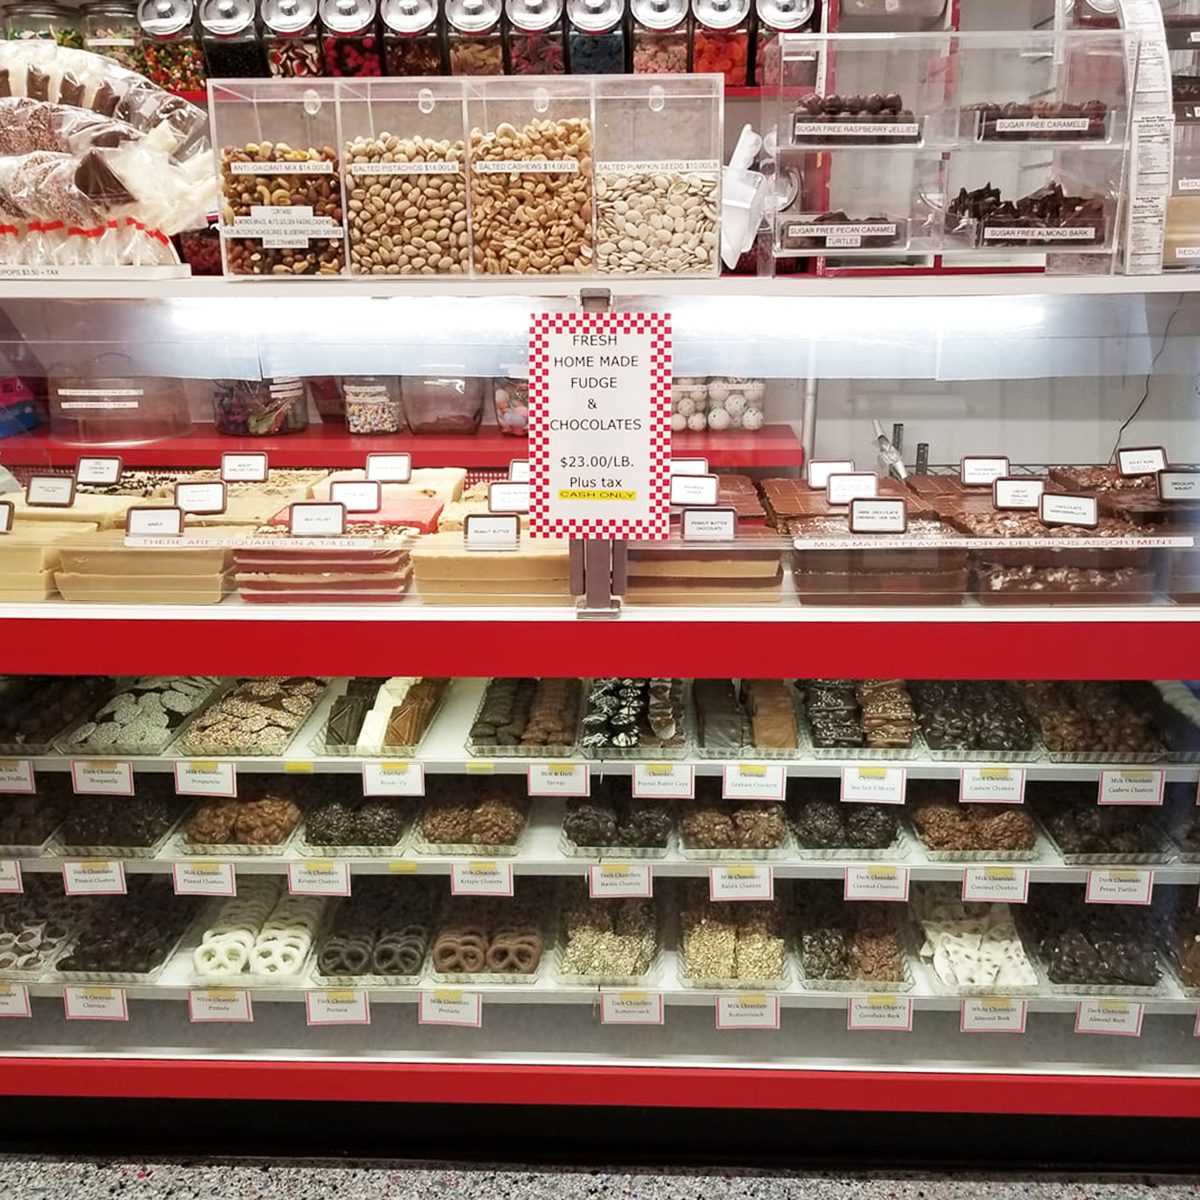 The Best Fudge Shop in New York - Fudge N' Stuff Inc